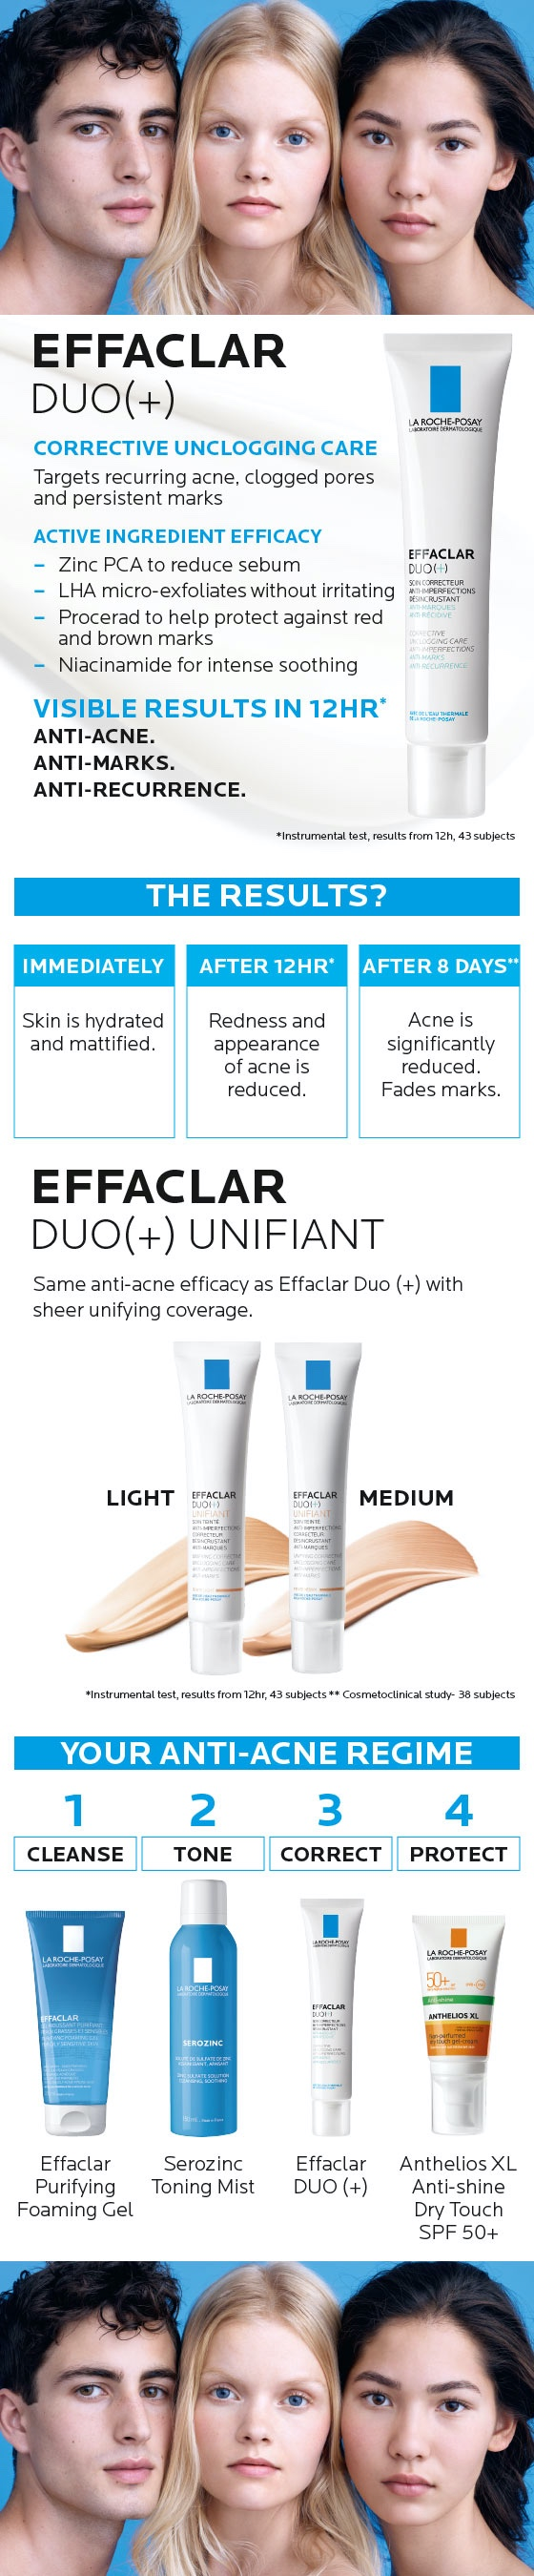 La Roche-Posay Effaclar Duo Plus 40ml